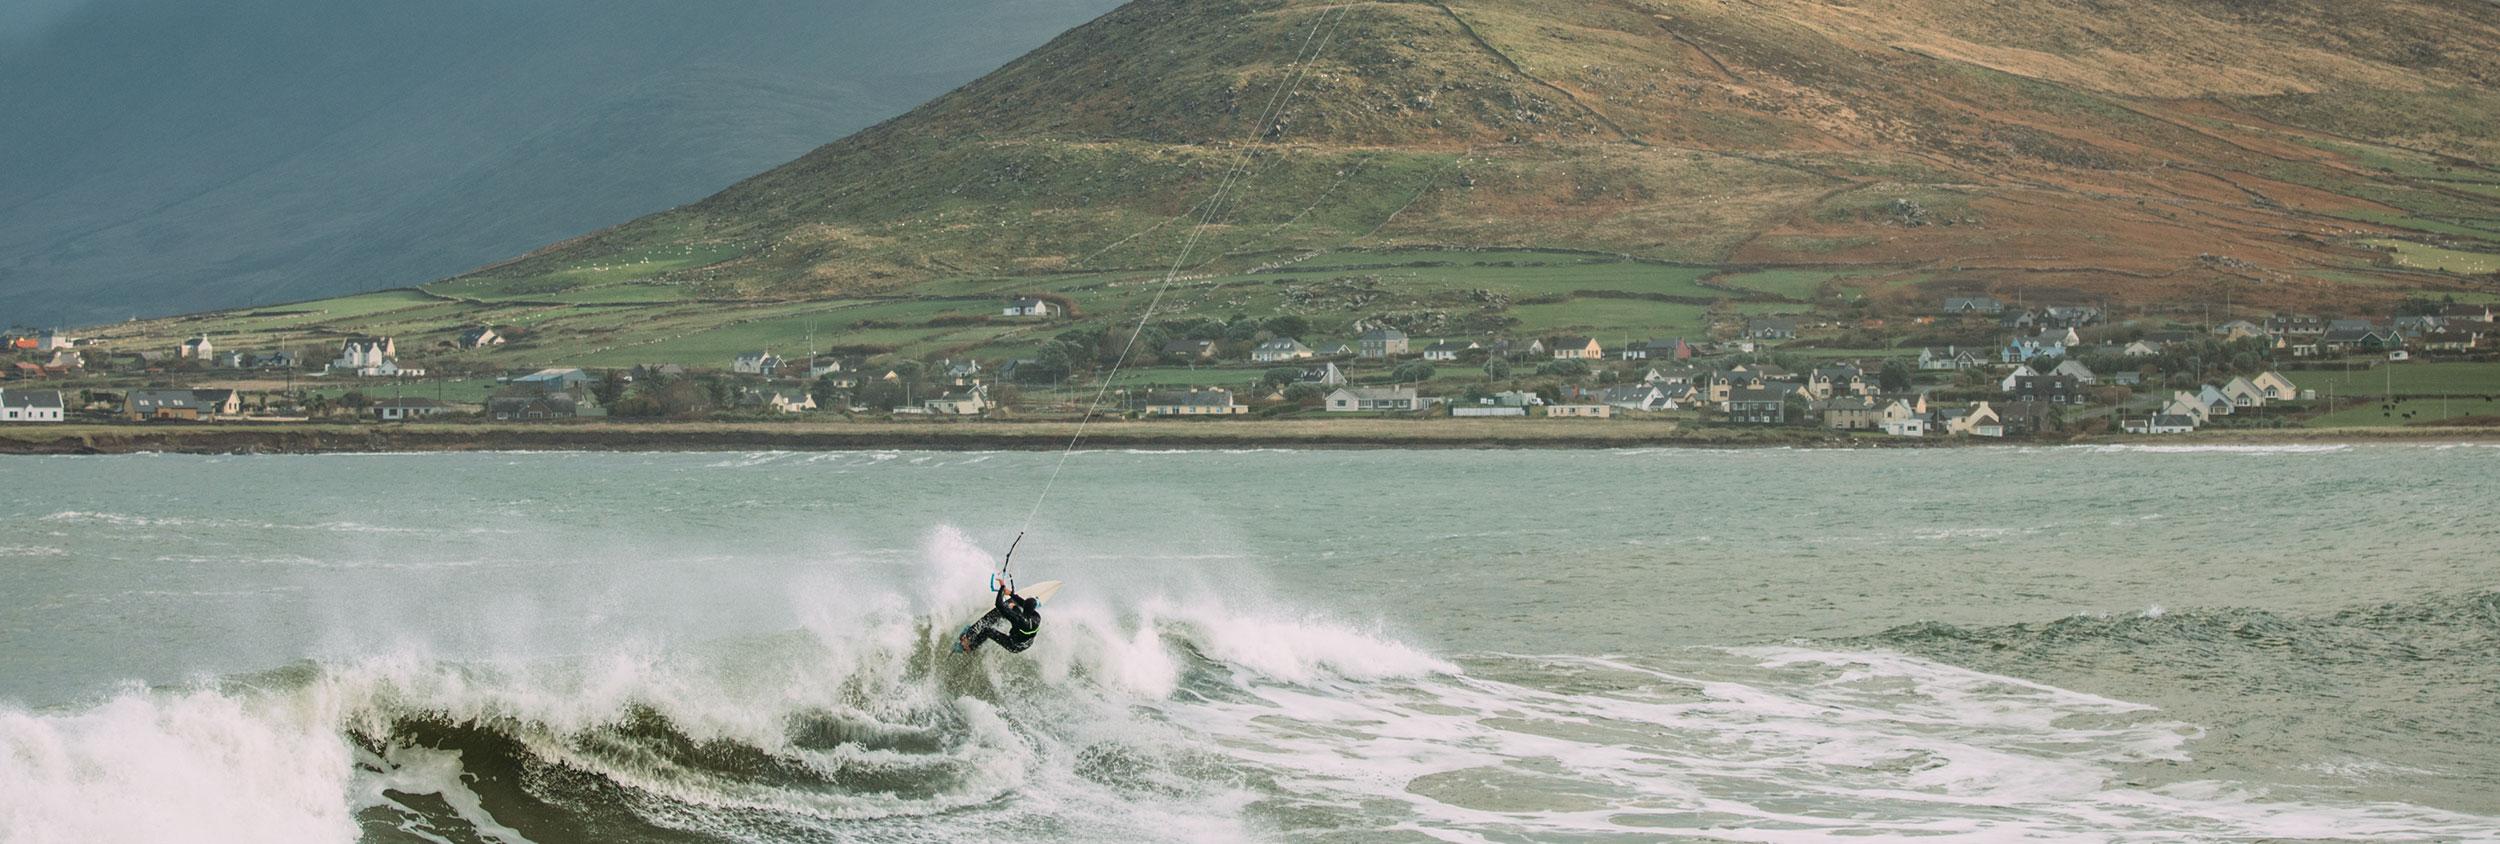 Wave Kitesurfing in Ireland